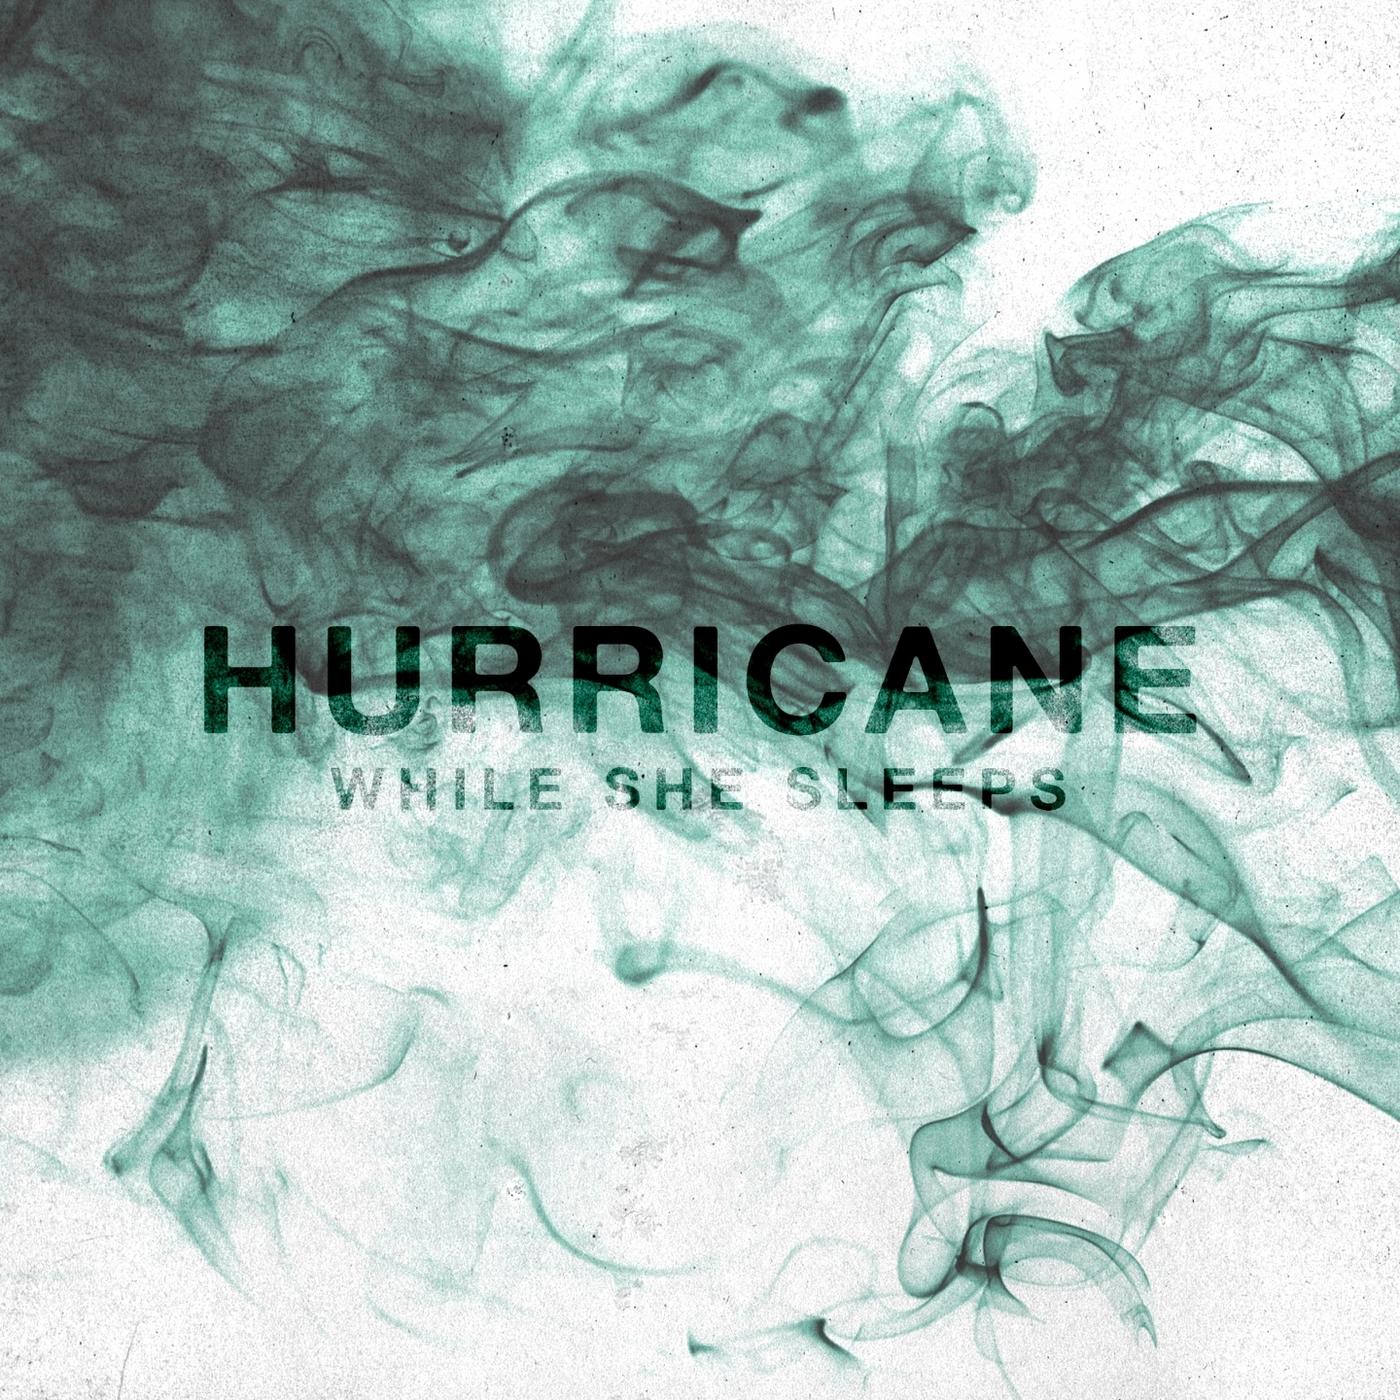 While She Sleeps - Hurricane [single] (2016)